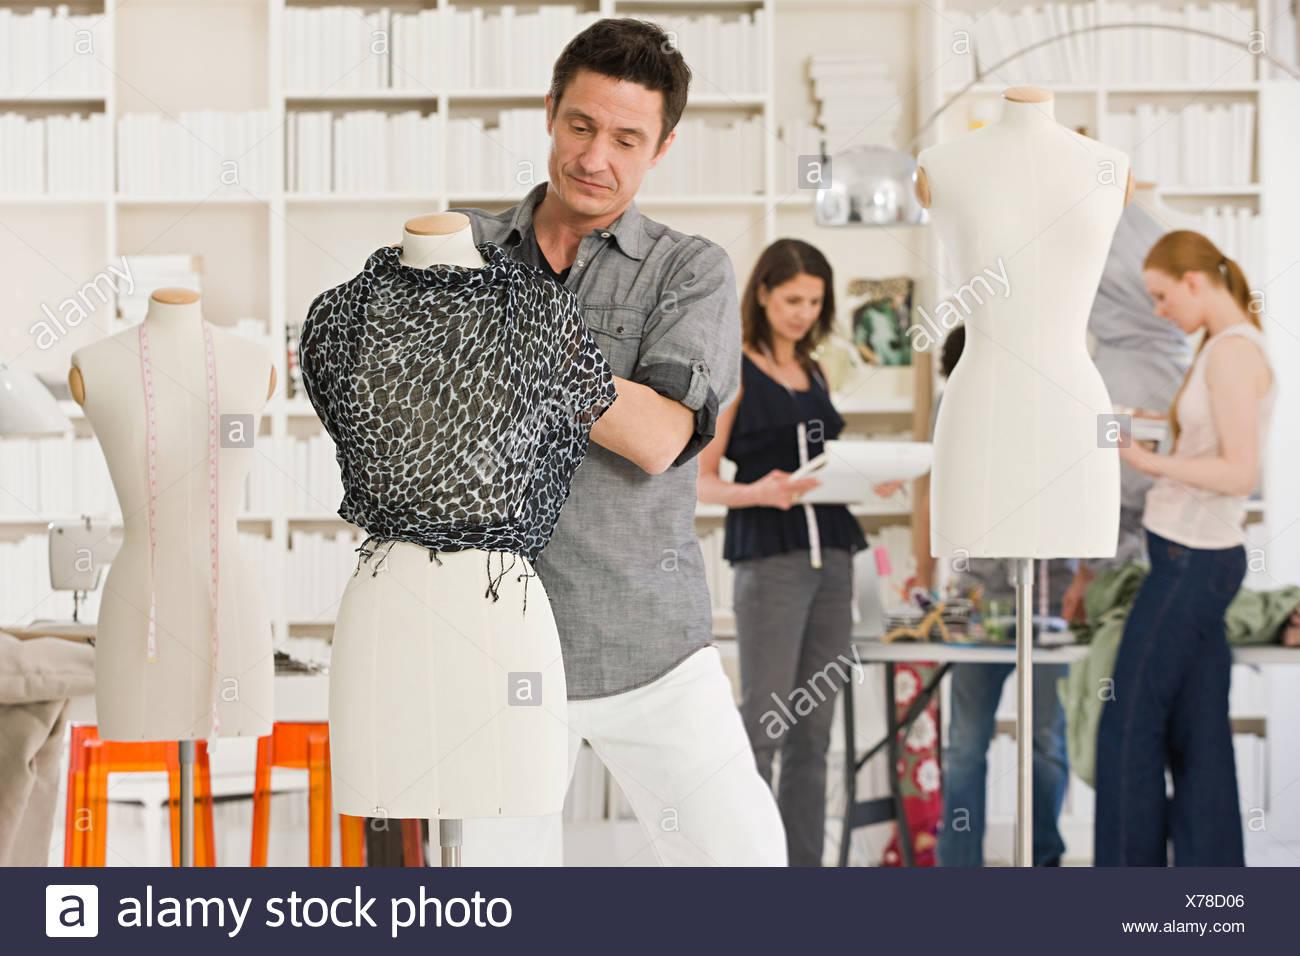 Fashion Designers At Work Stock Photo Alamy